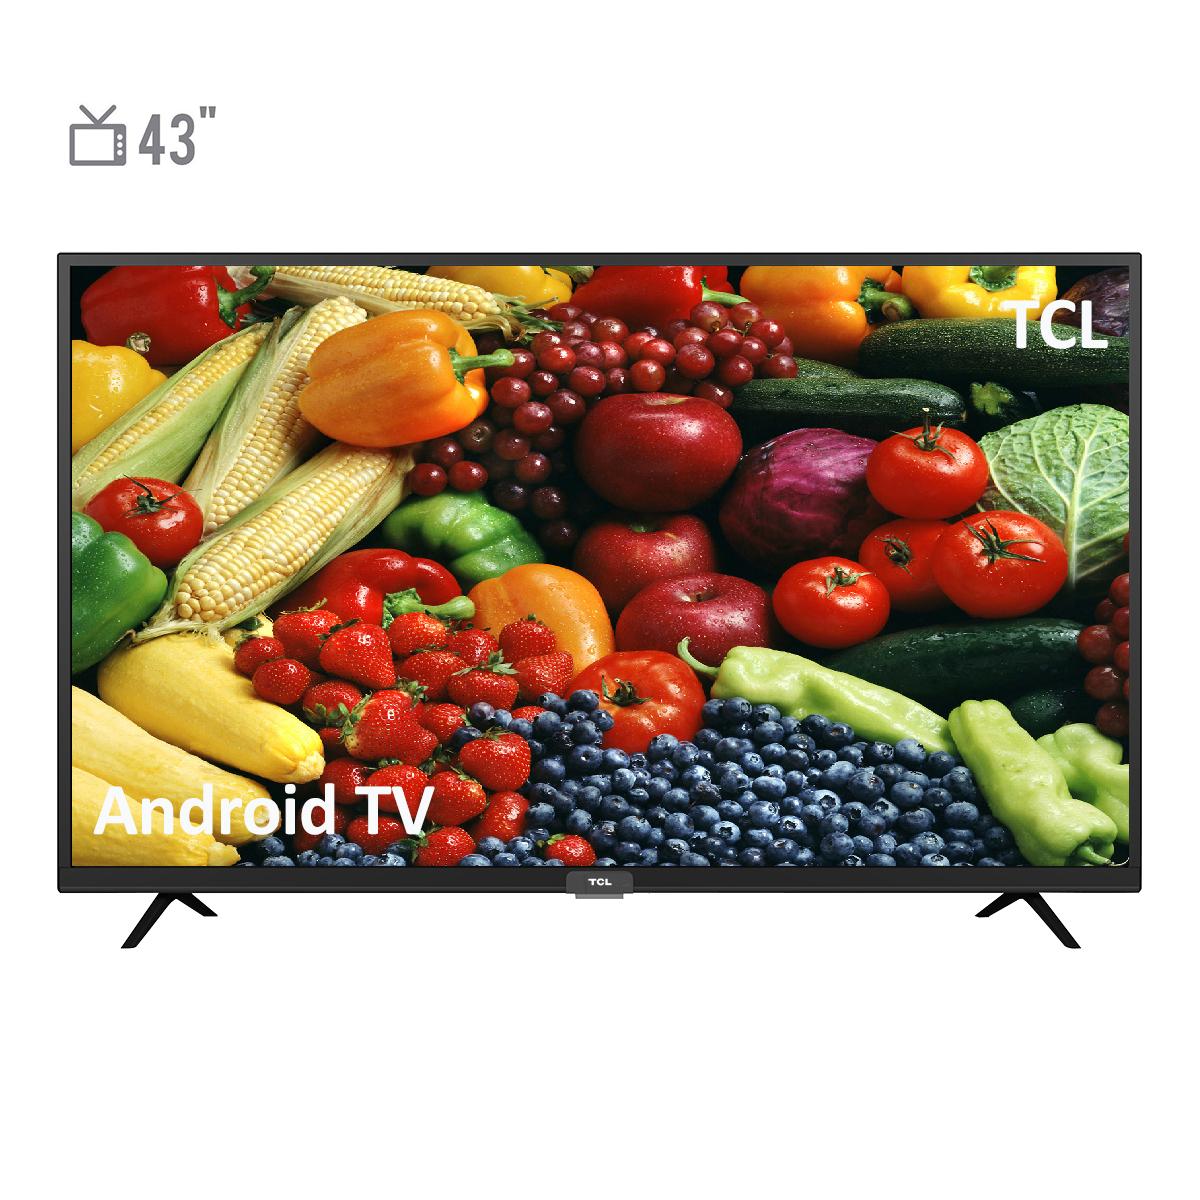 فروش نقدی و اقساطی تلویزیون TCL مدل 43S6510